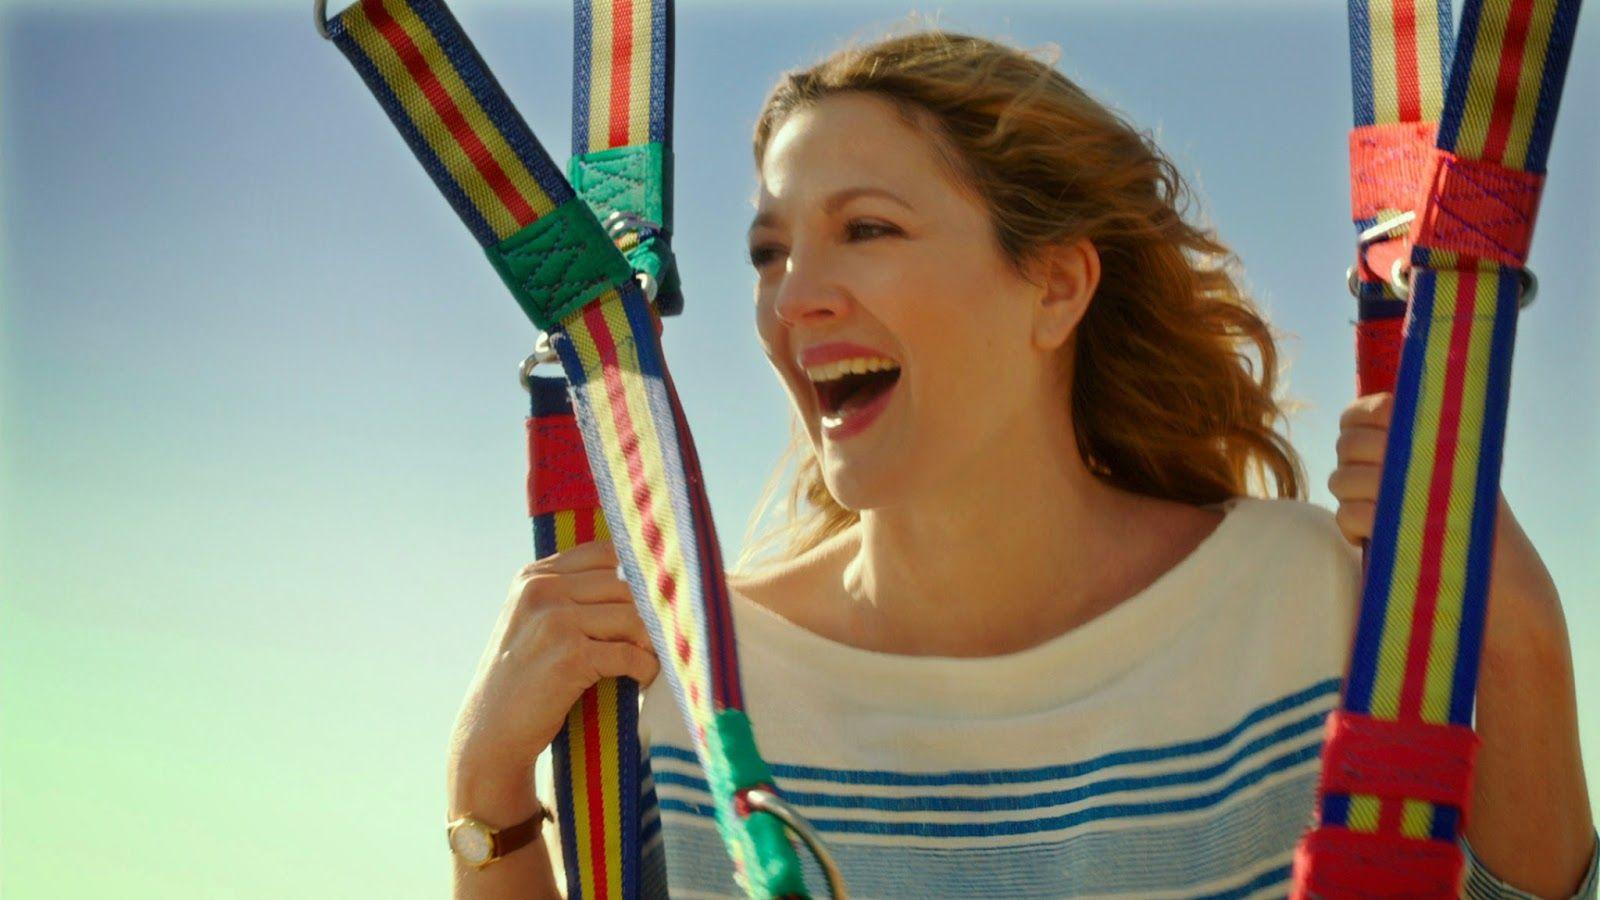 91 Blended 愛混在一起 Ideas Adam Sandler Blended Movie Drew Barrymore